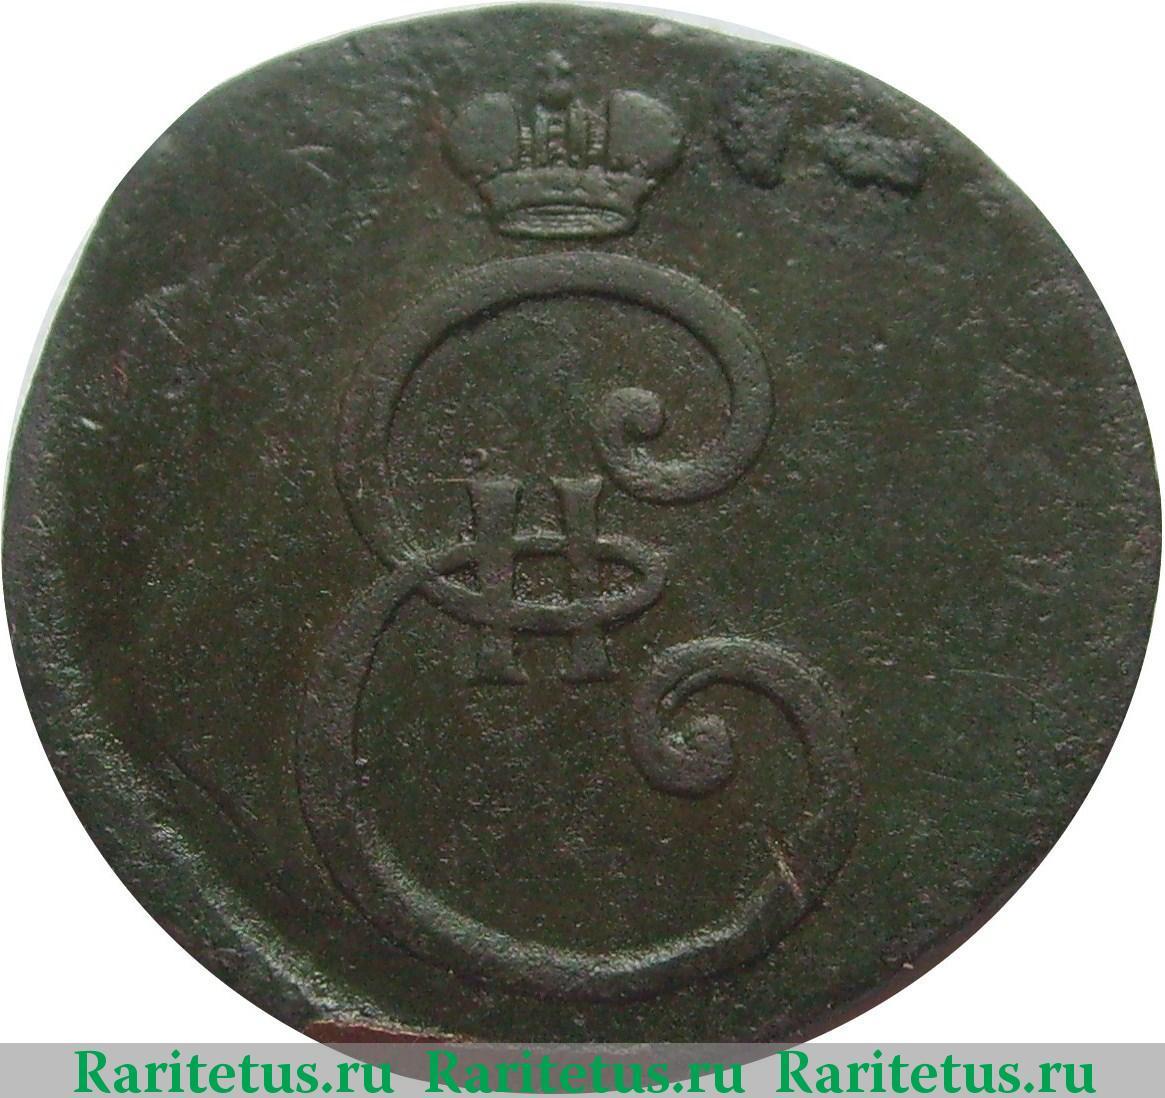 Монеты эпохи екатерины 2 3 рубля сталинградская битва 1993 г